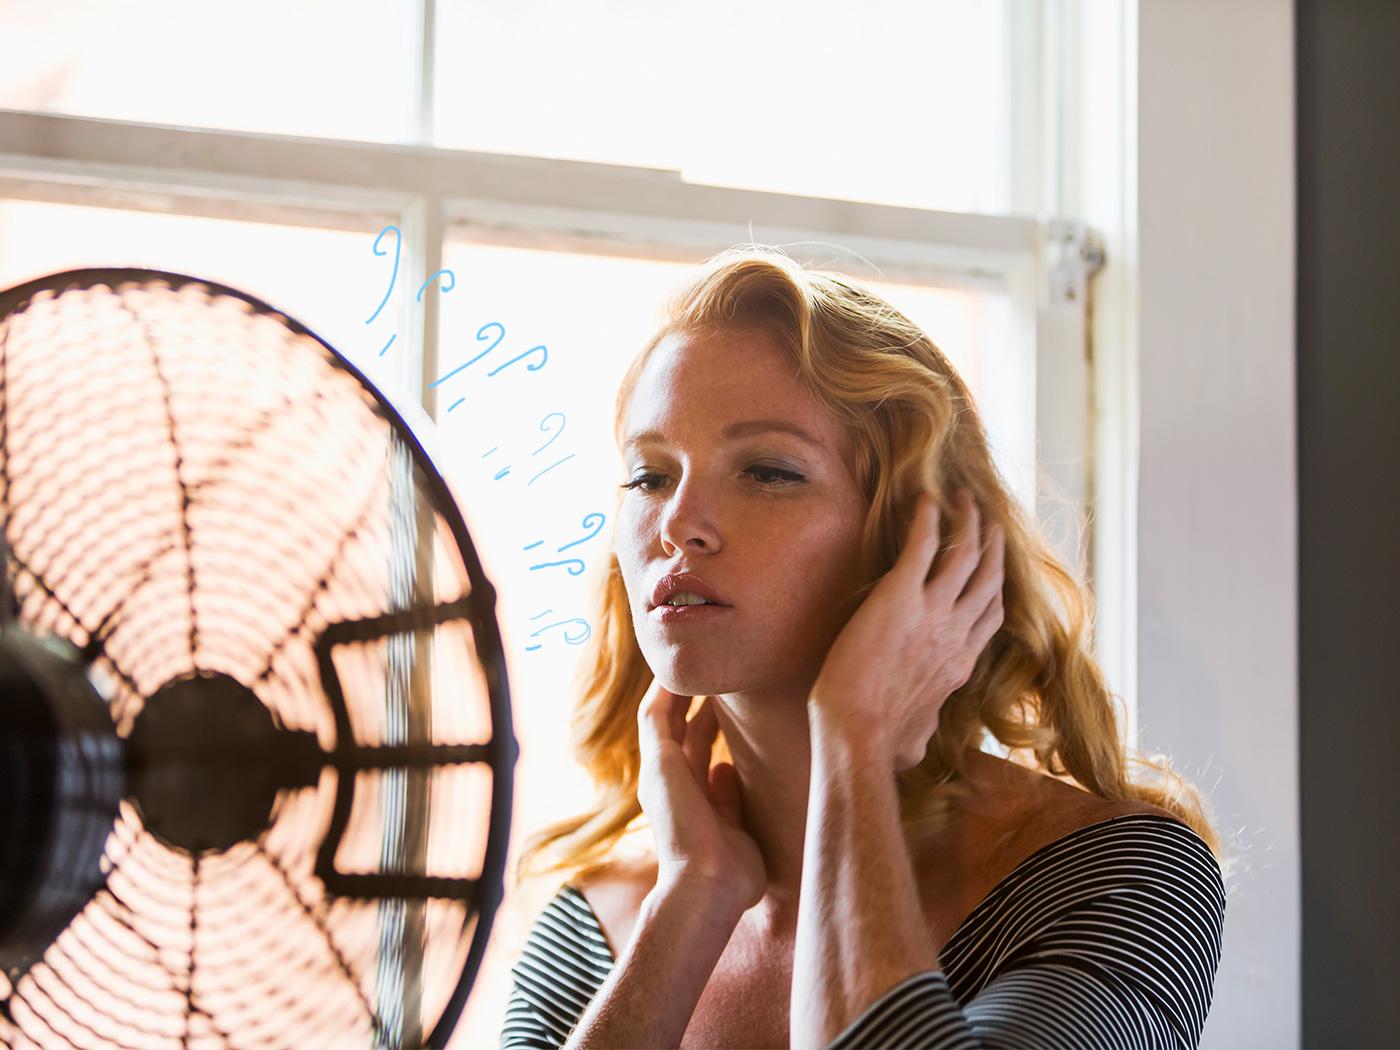 6 beauty τρόποι να δροσιστείς μέσα στον καύσωνα!